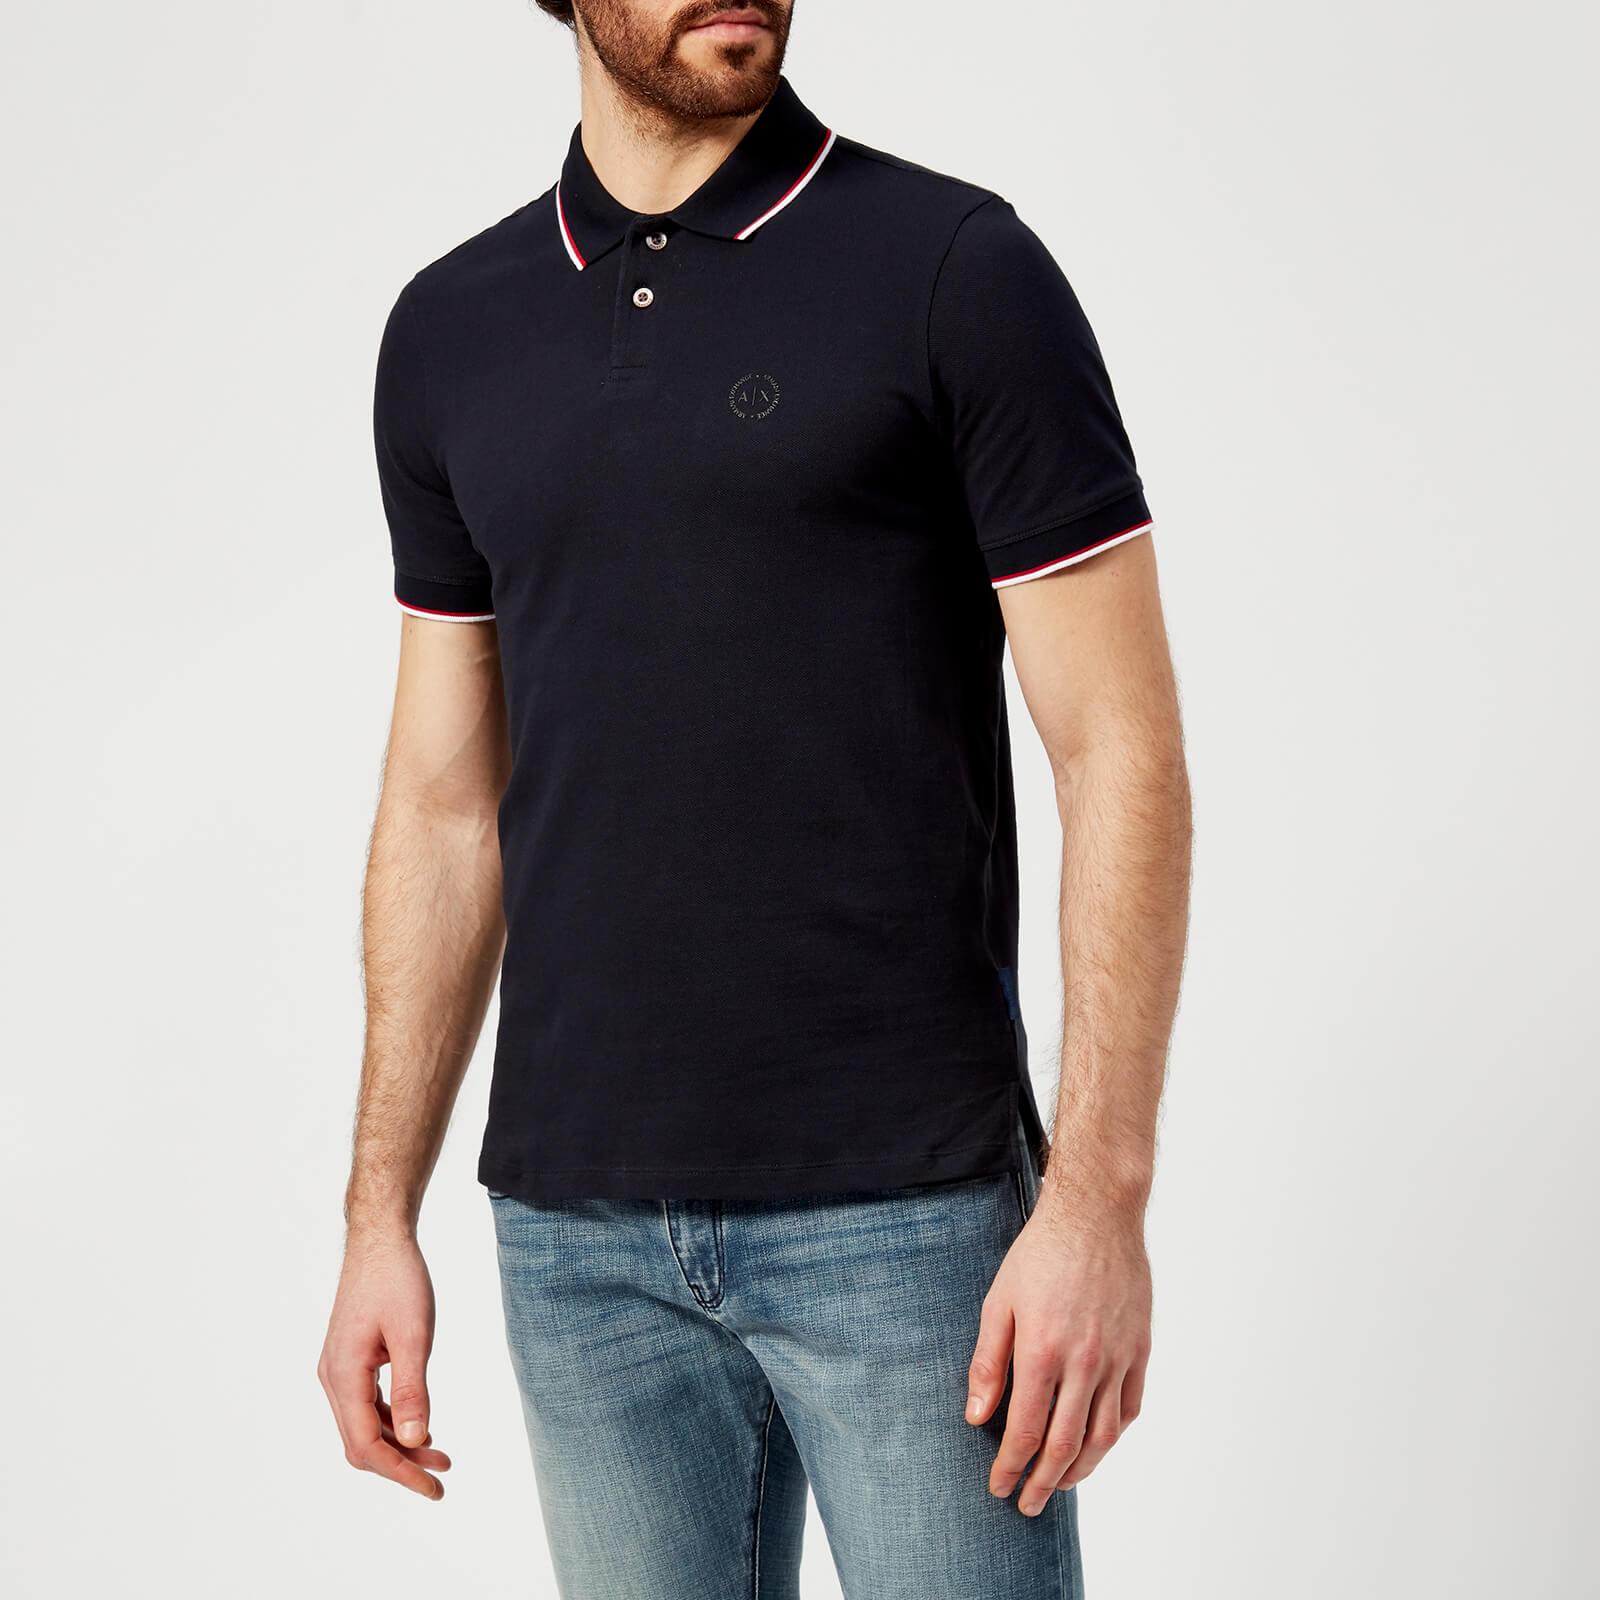 7952383a Armani Exchange Men's Tipped Polo Shirt - Navy Clothing | TheHut.com